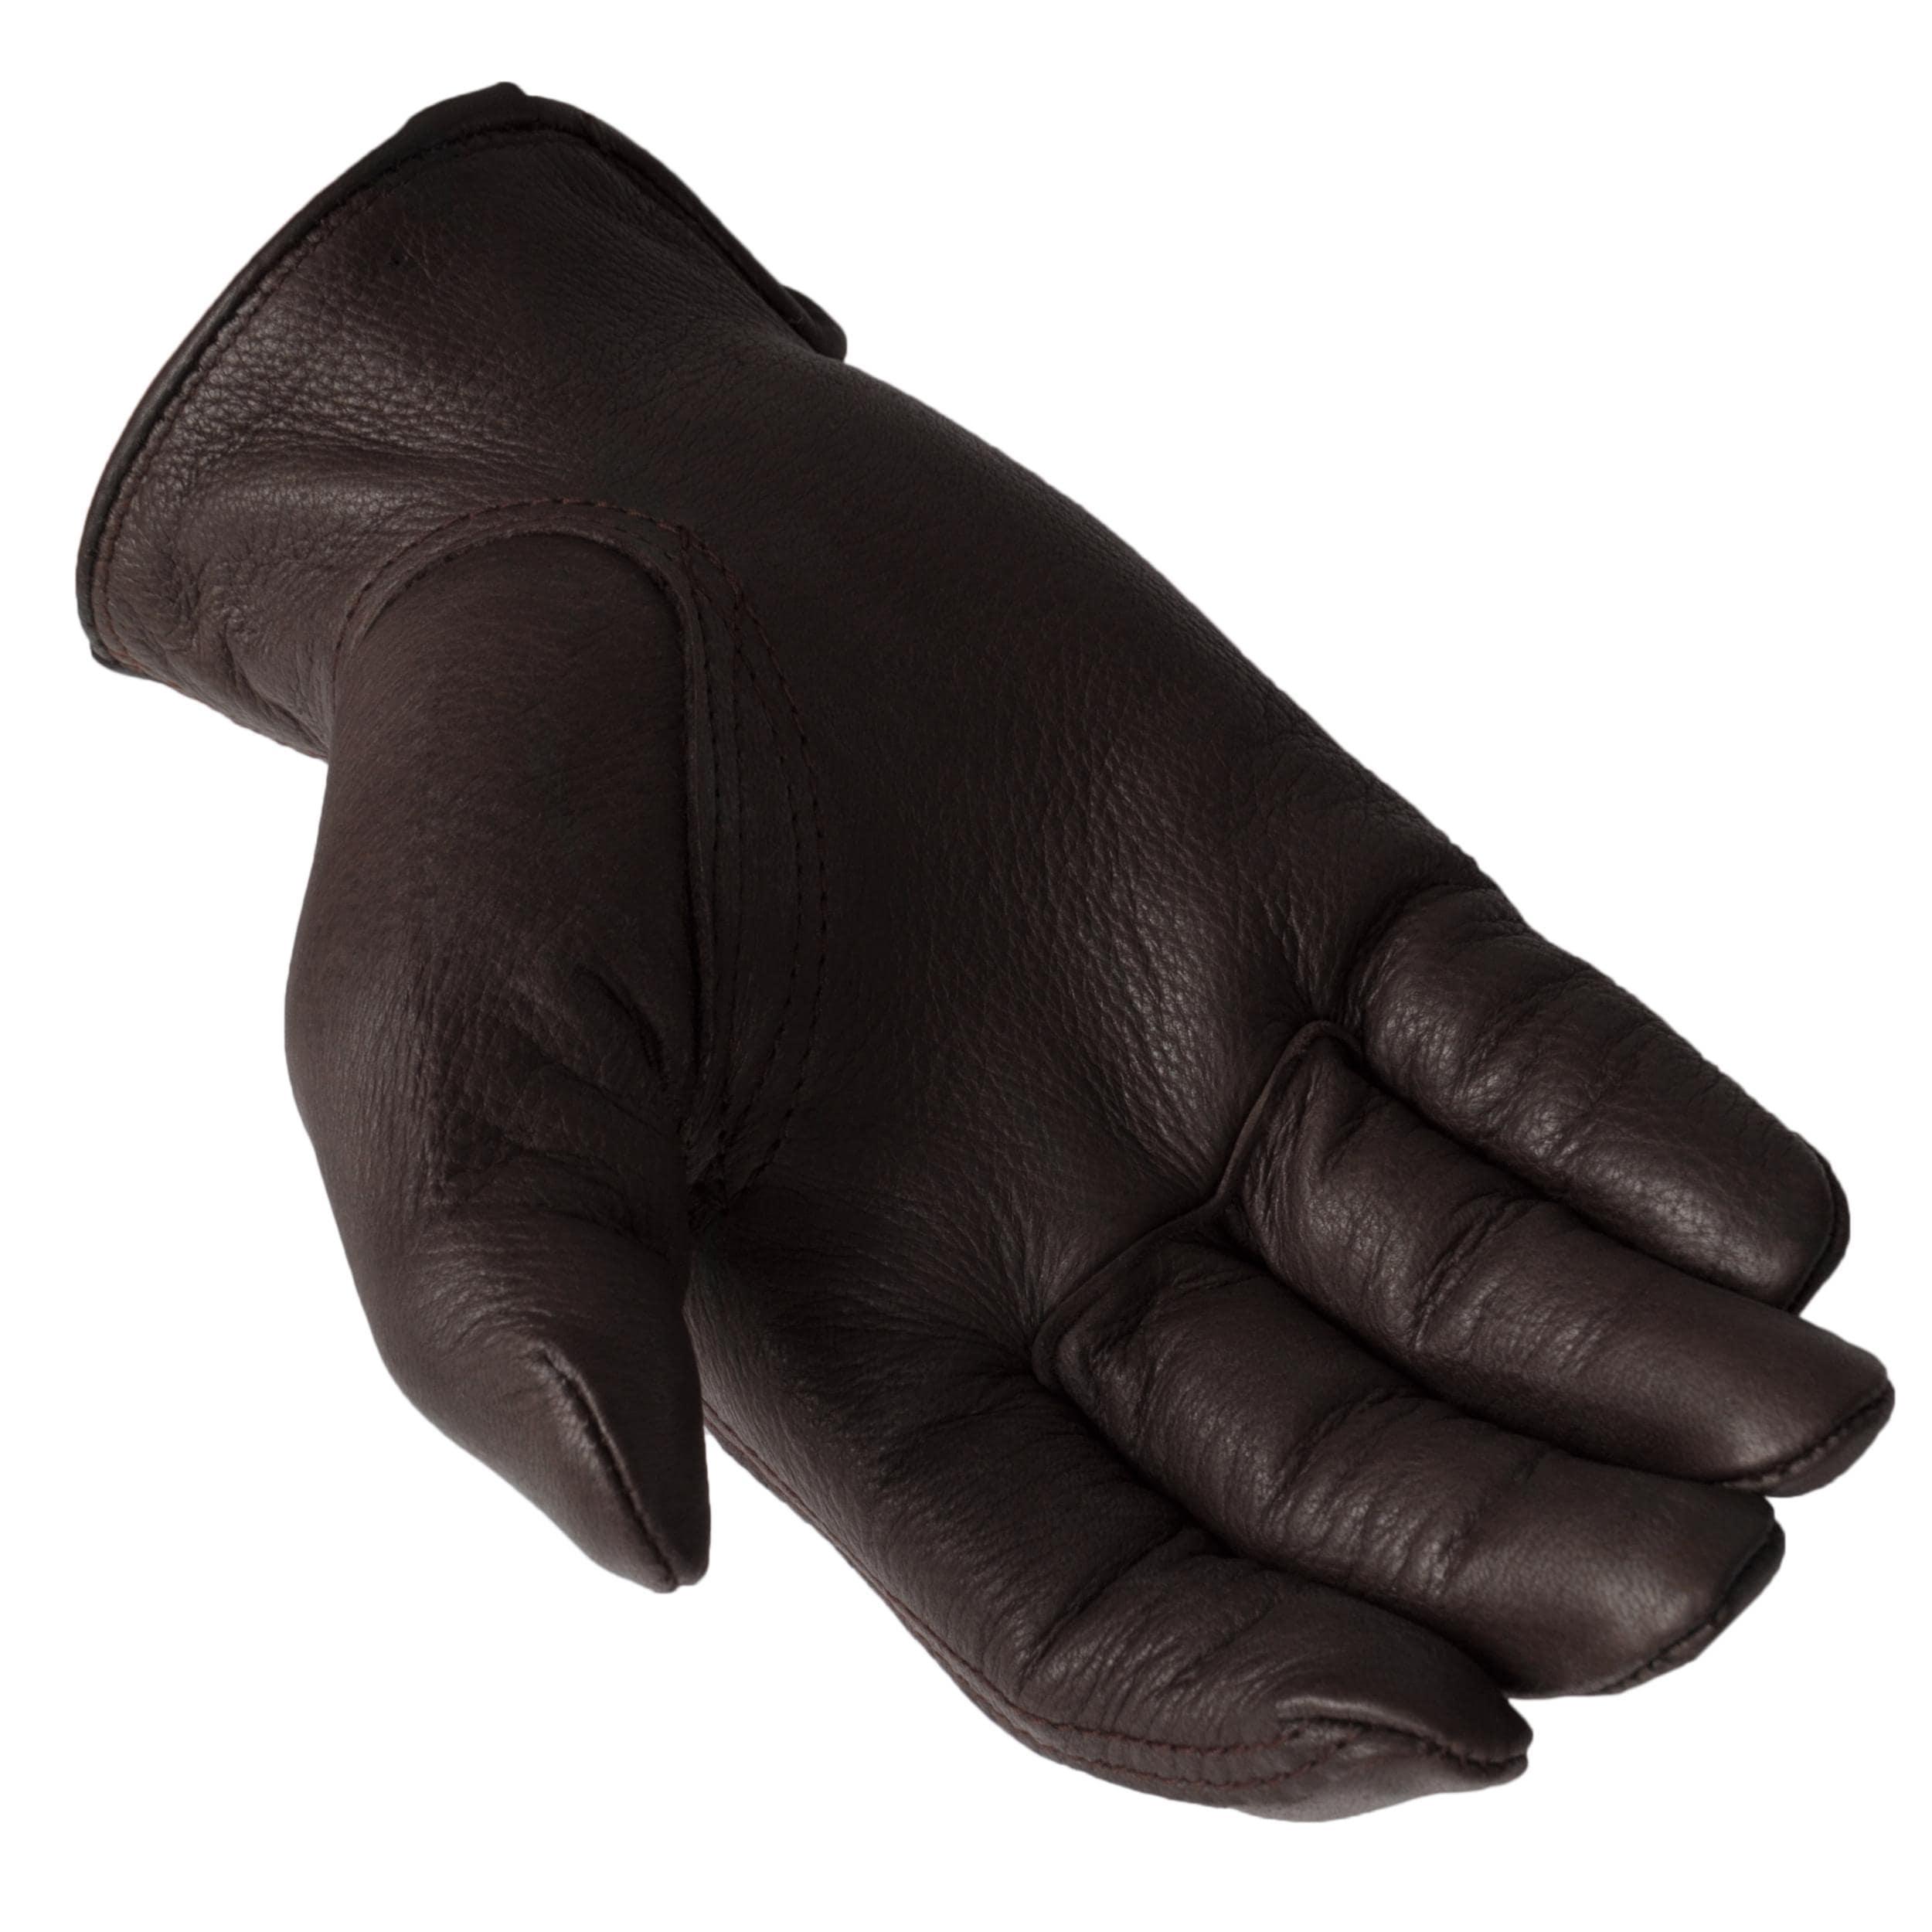 Daxx Men's Top Grain Deerskin Leather Bird Dog Wildlife Print Gloves - Thumbnail 1